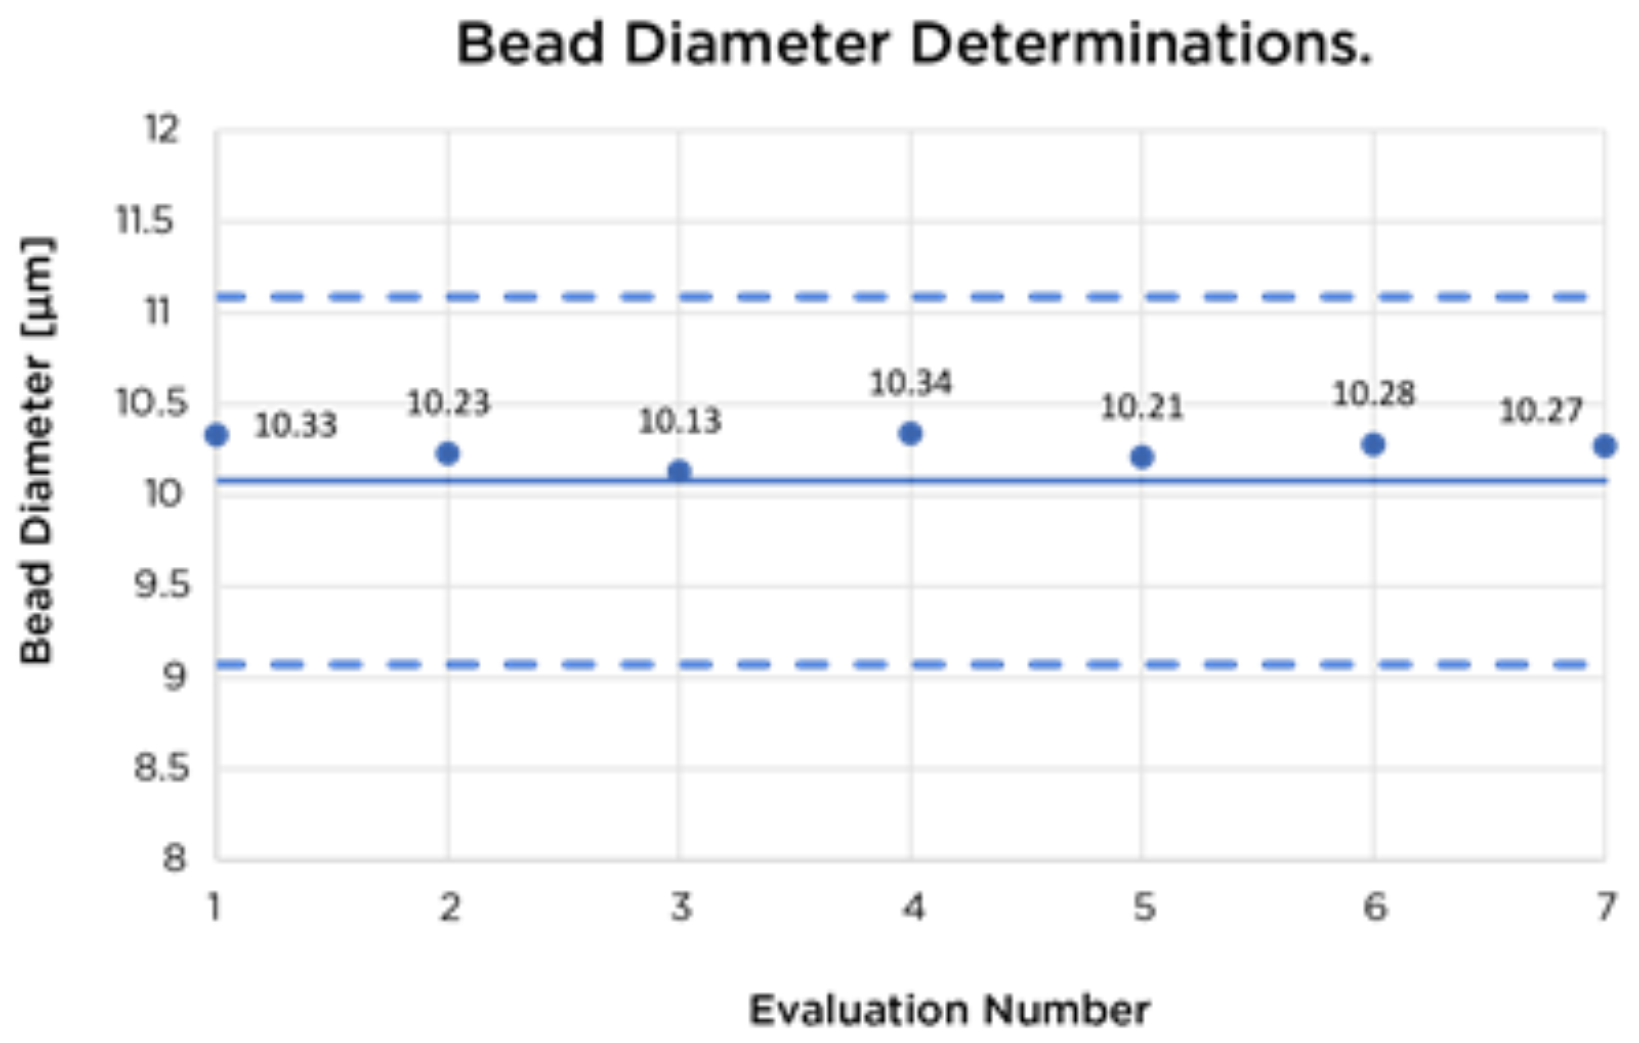 bead diameter determinations of evaluation run vi-cell blu